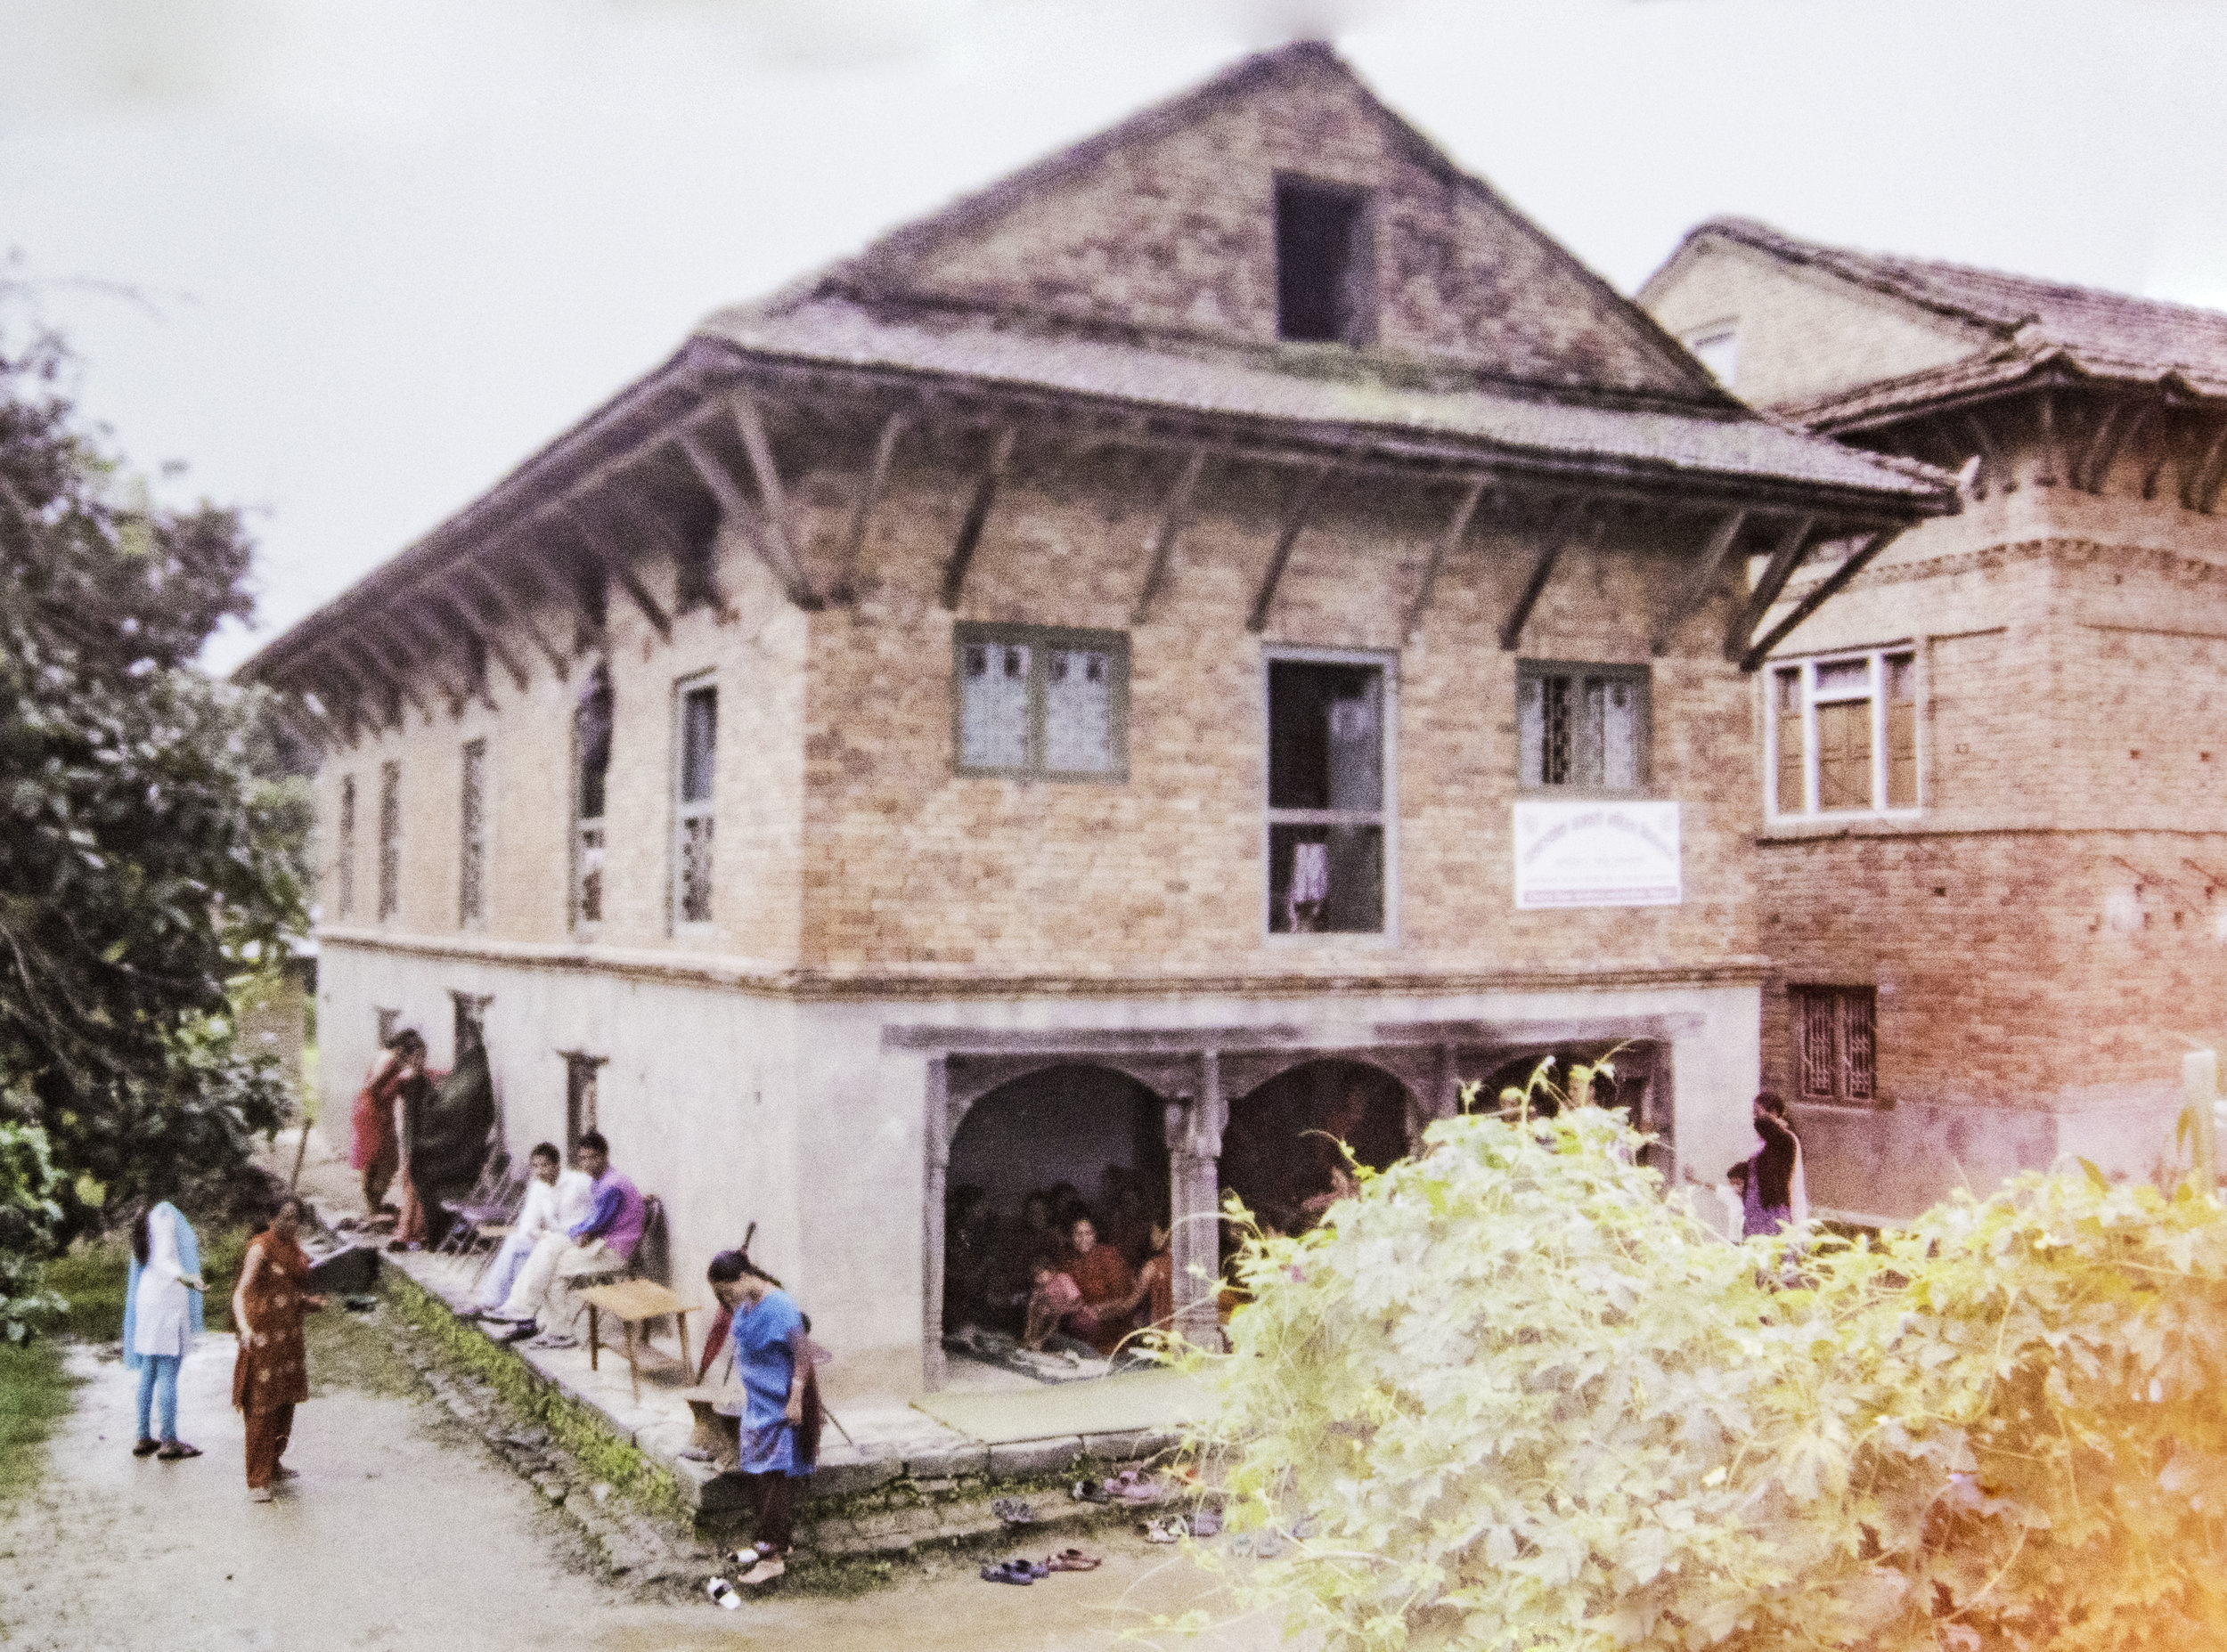 Nepal volunteer education thisworldexists